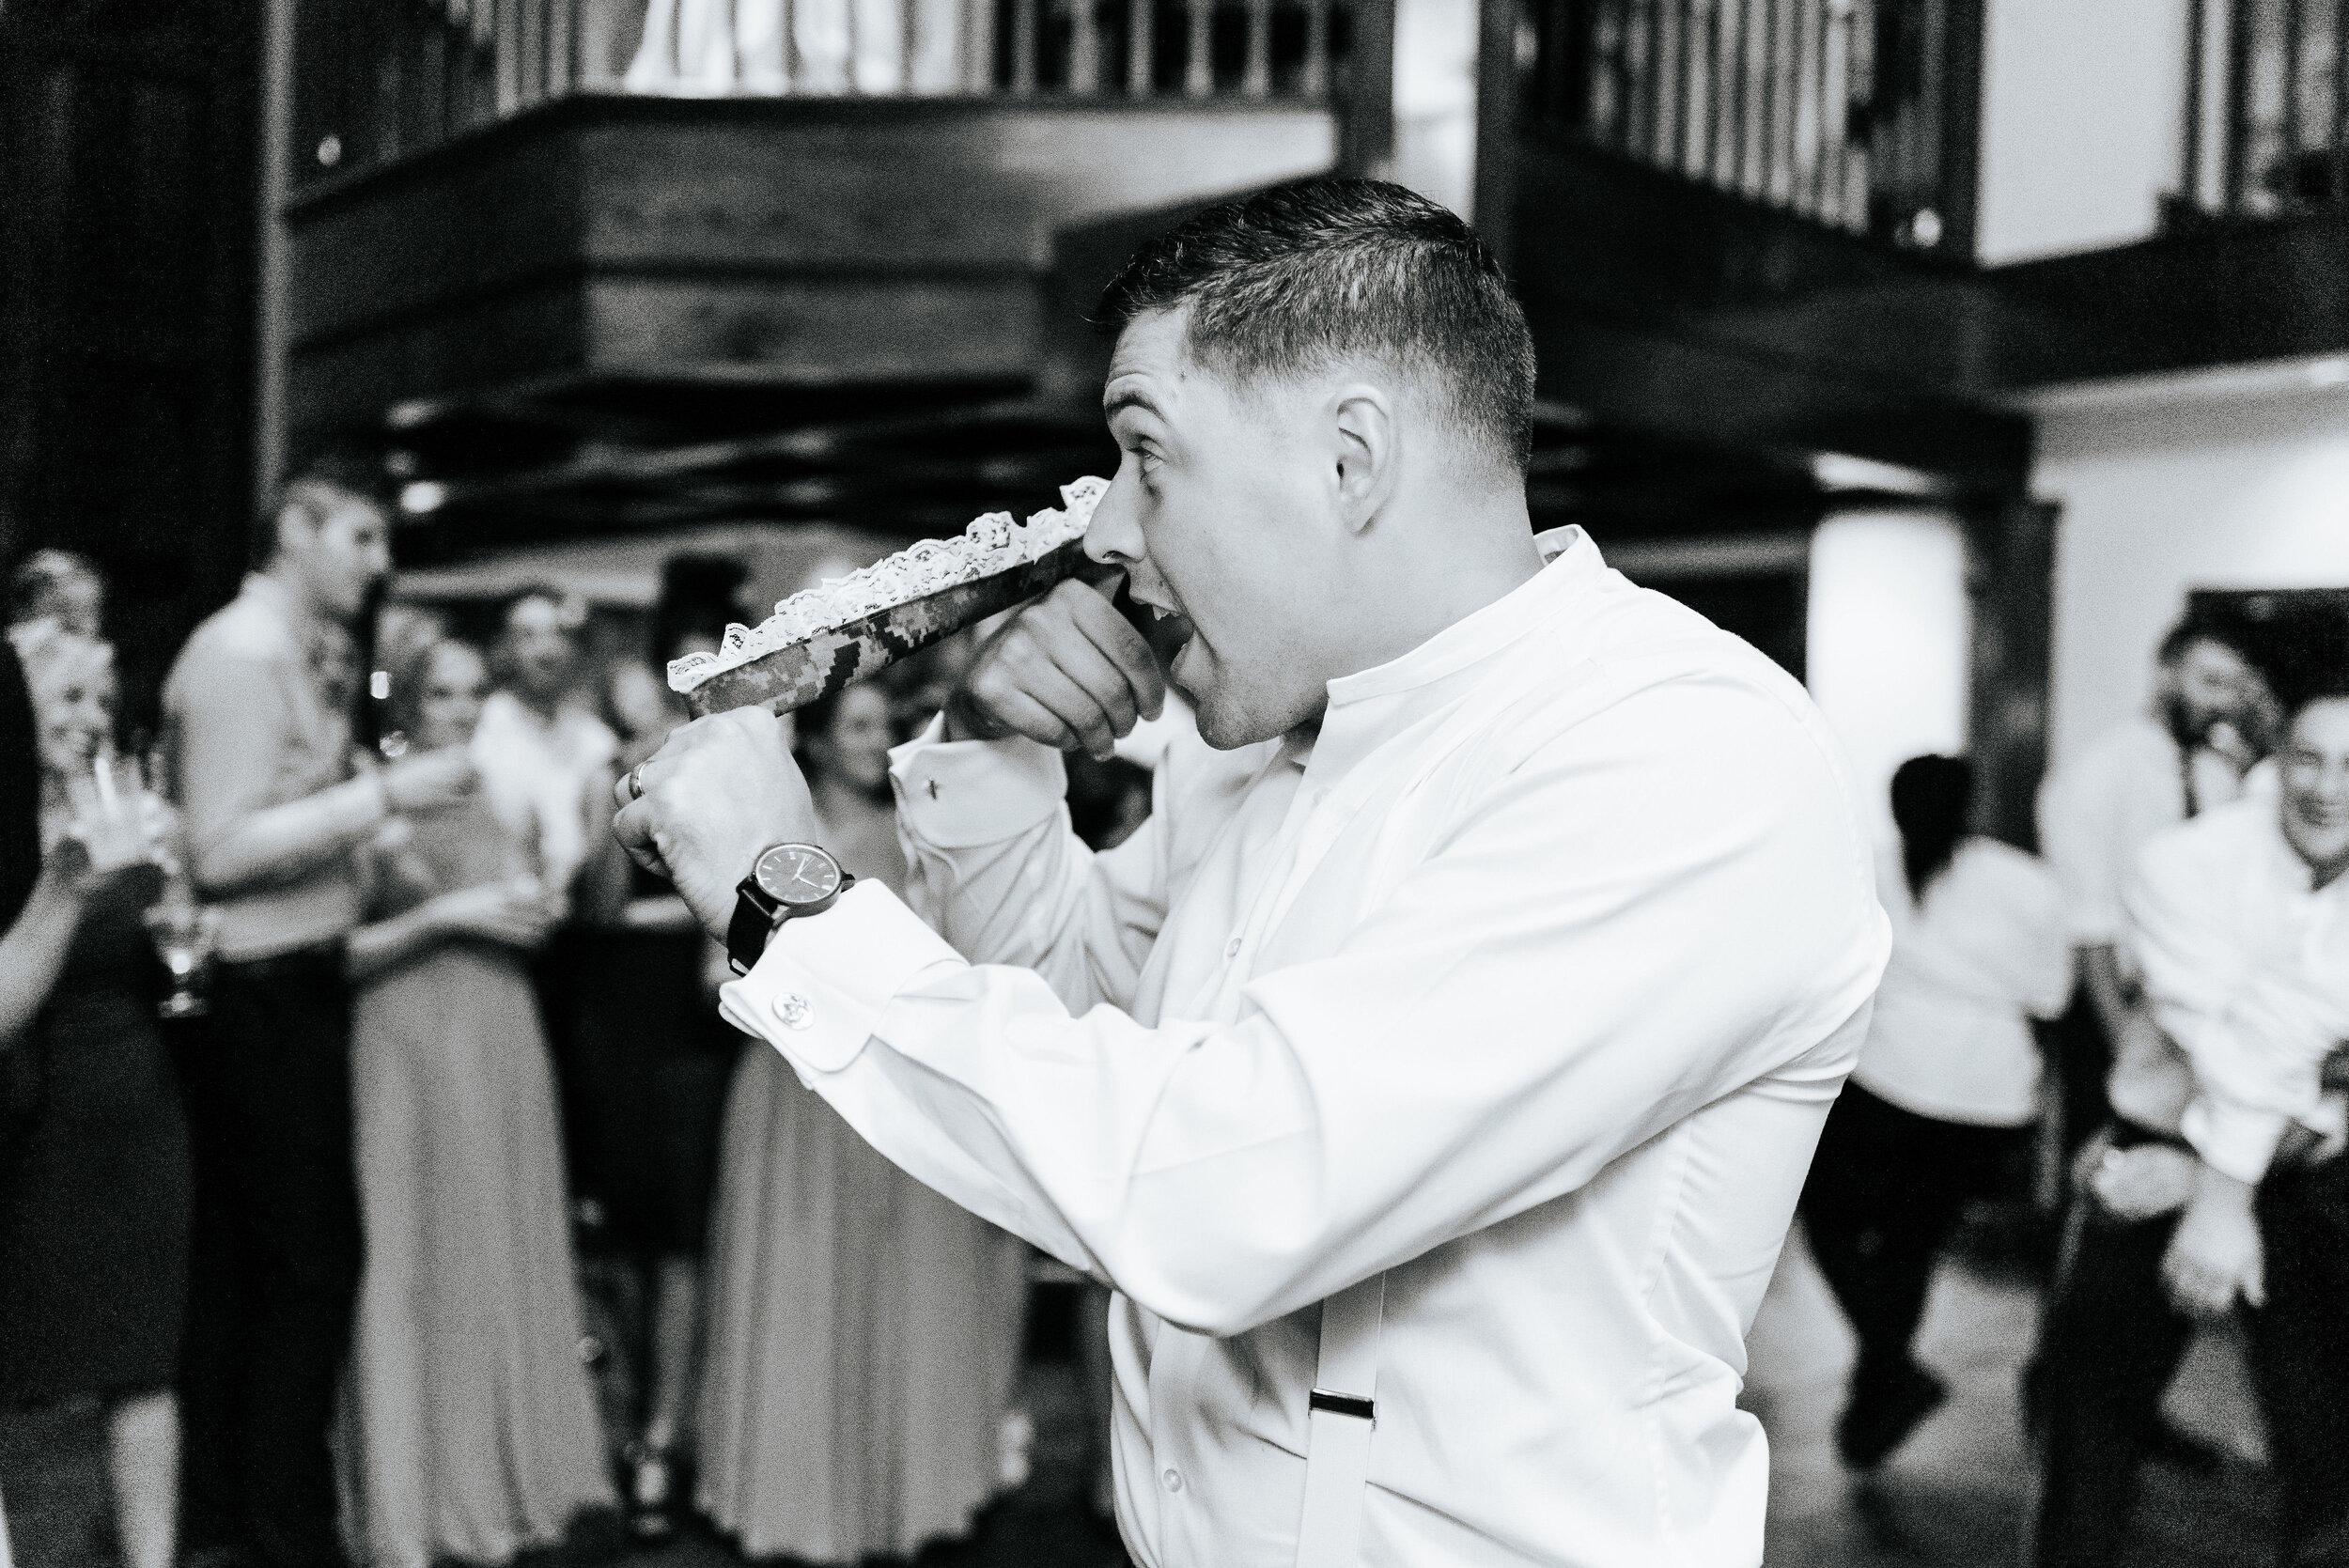 Emily_Mike_Wedding_Celebrations_at_the_Reservoir_Pool_Pavilion_Richmond_Virginia_Wedding_Photographer_Photography_by_V_112.jpg